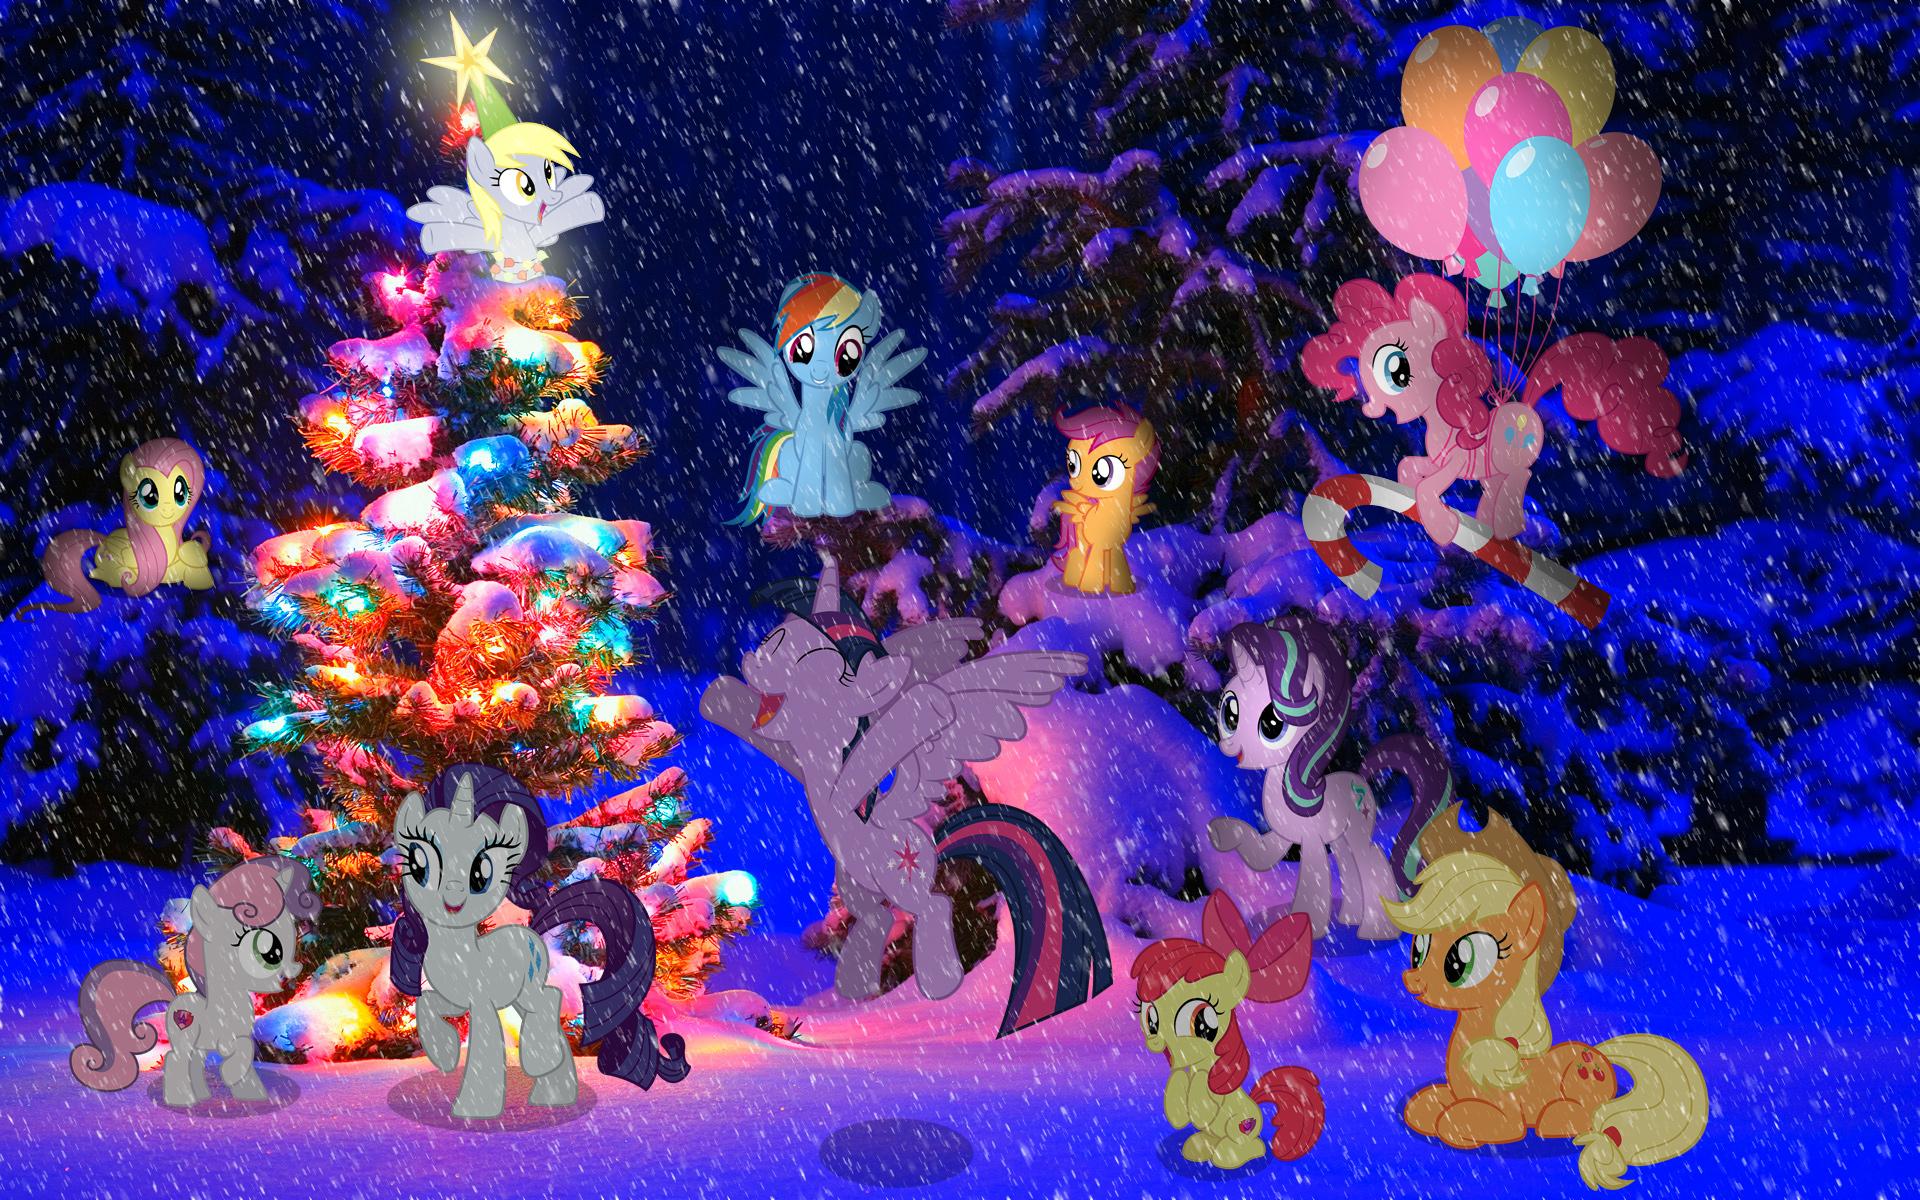 10 Best UHD 4k Christmas Wallpapers 2017. | AxeeNow